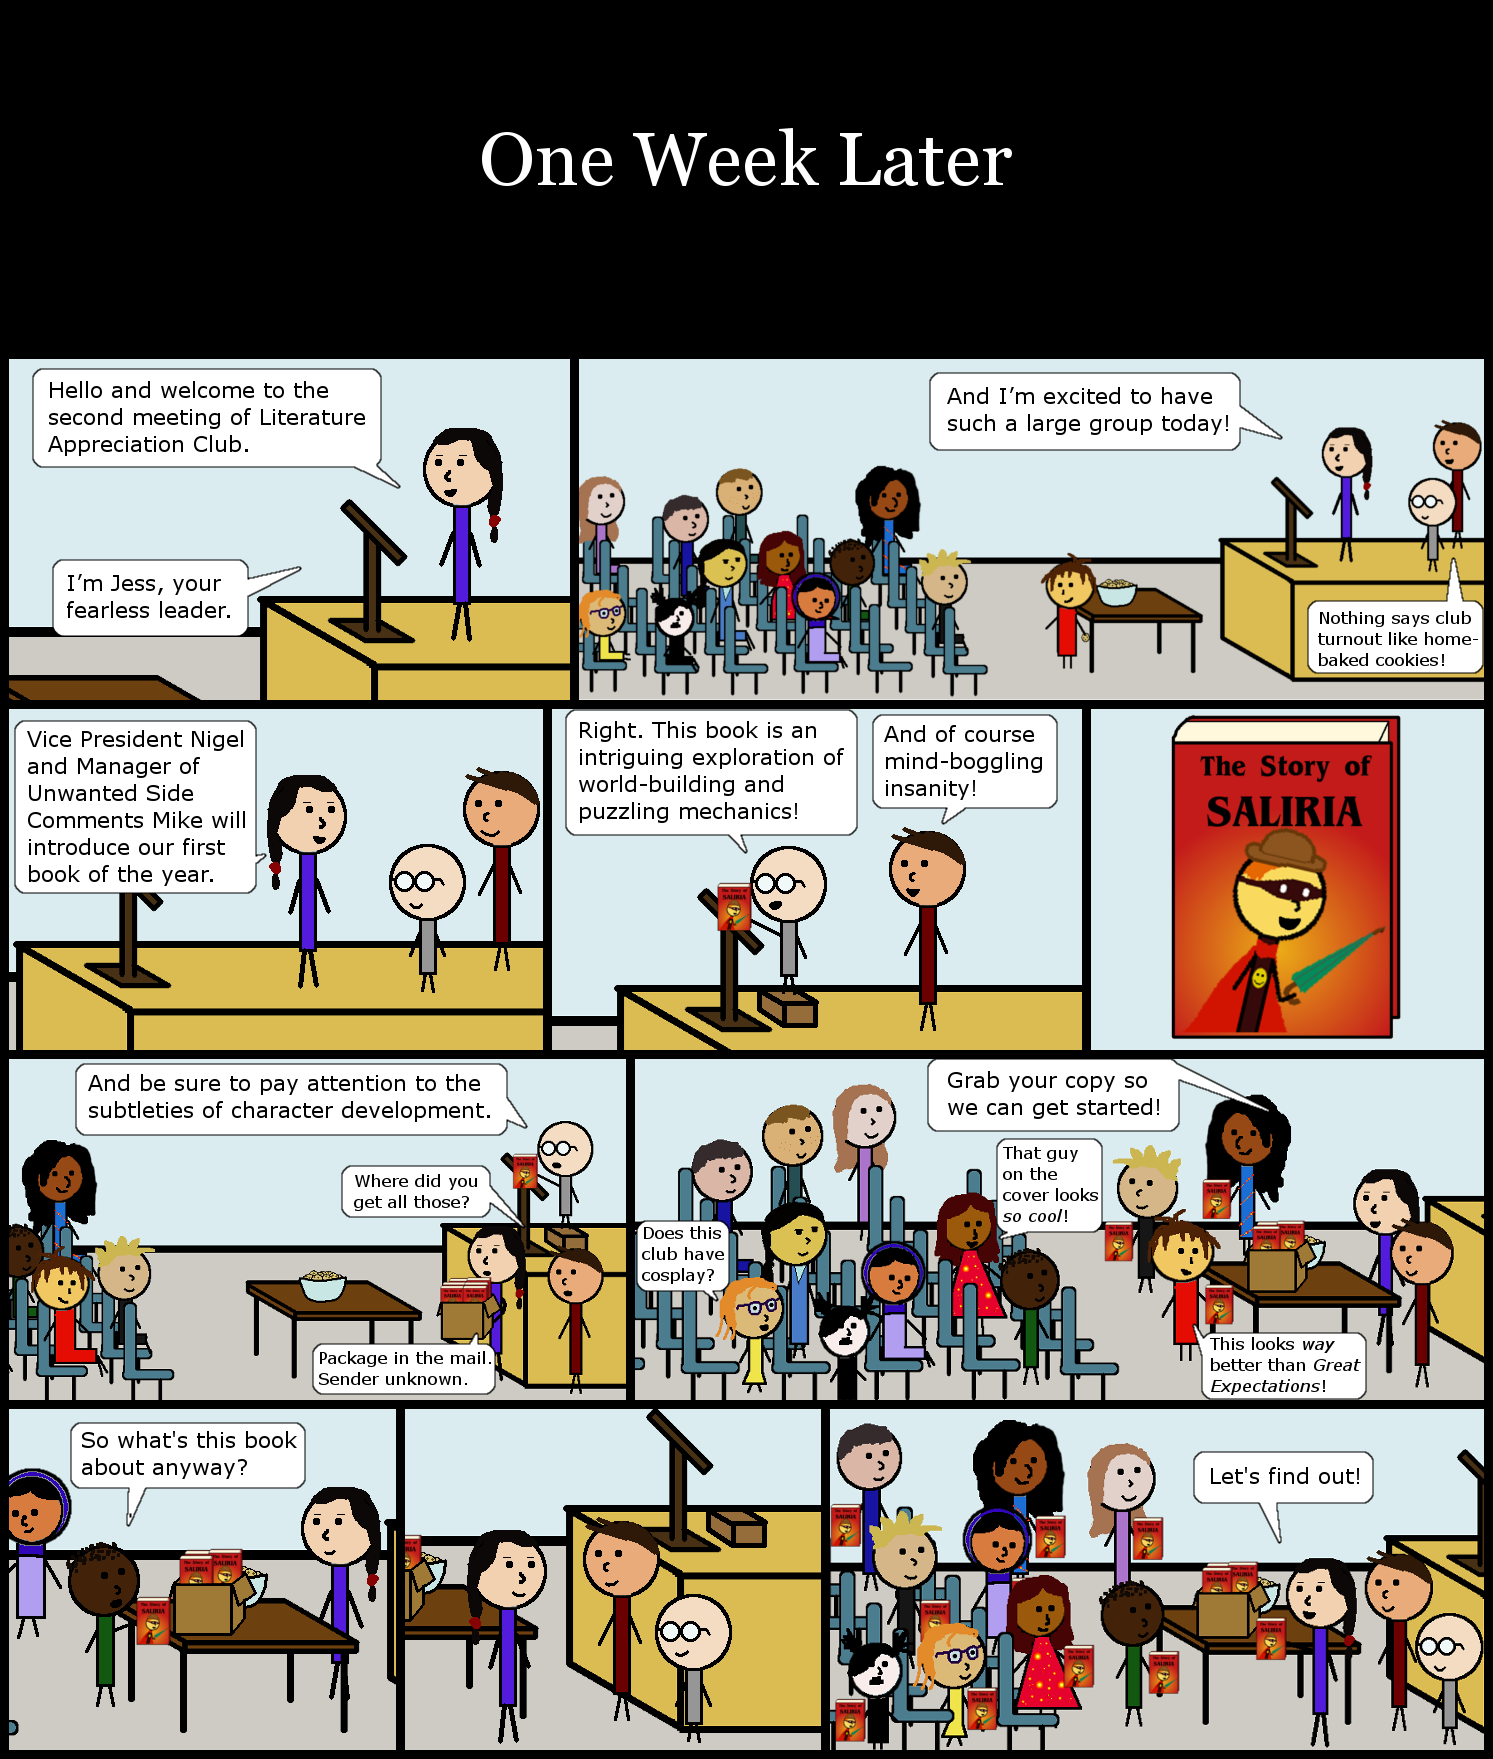 Epilogue: One Week Later